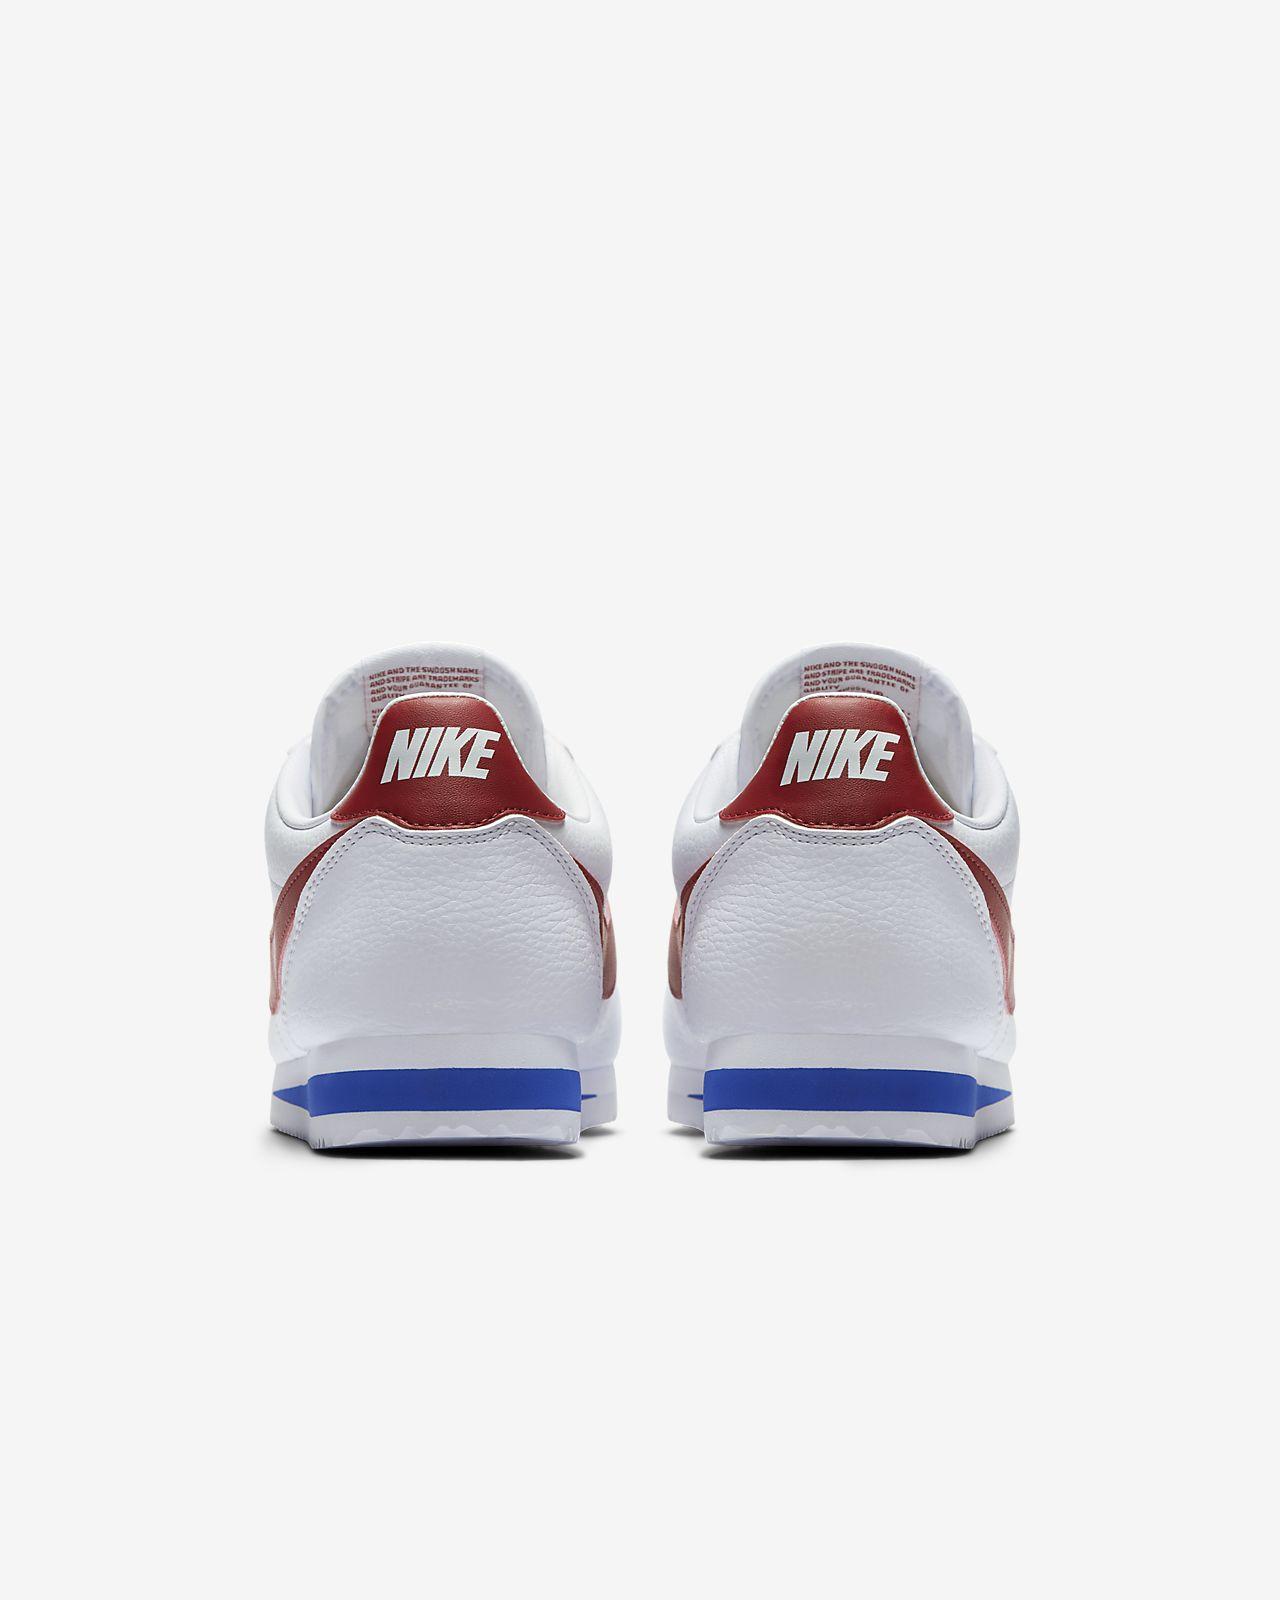 nike classic cortez nylon blanco rojo azul